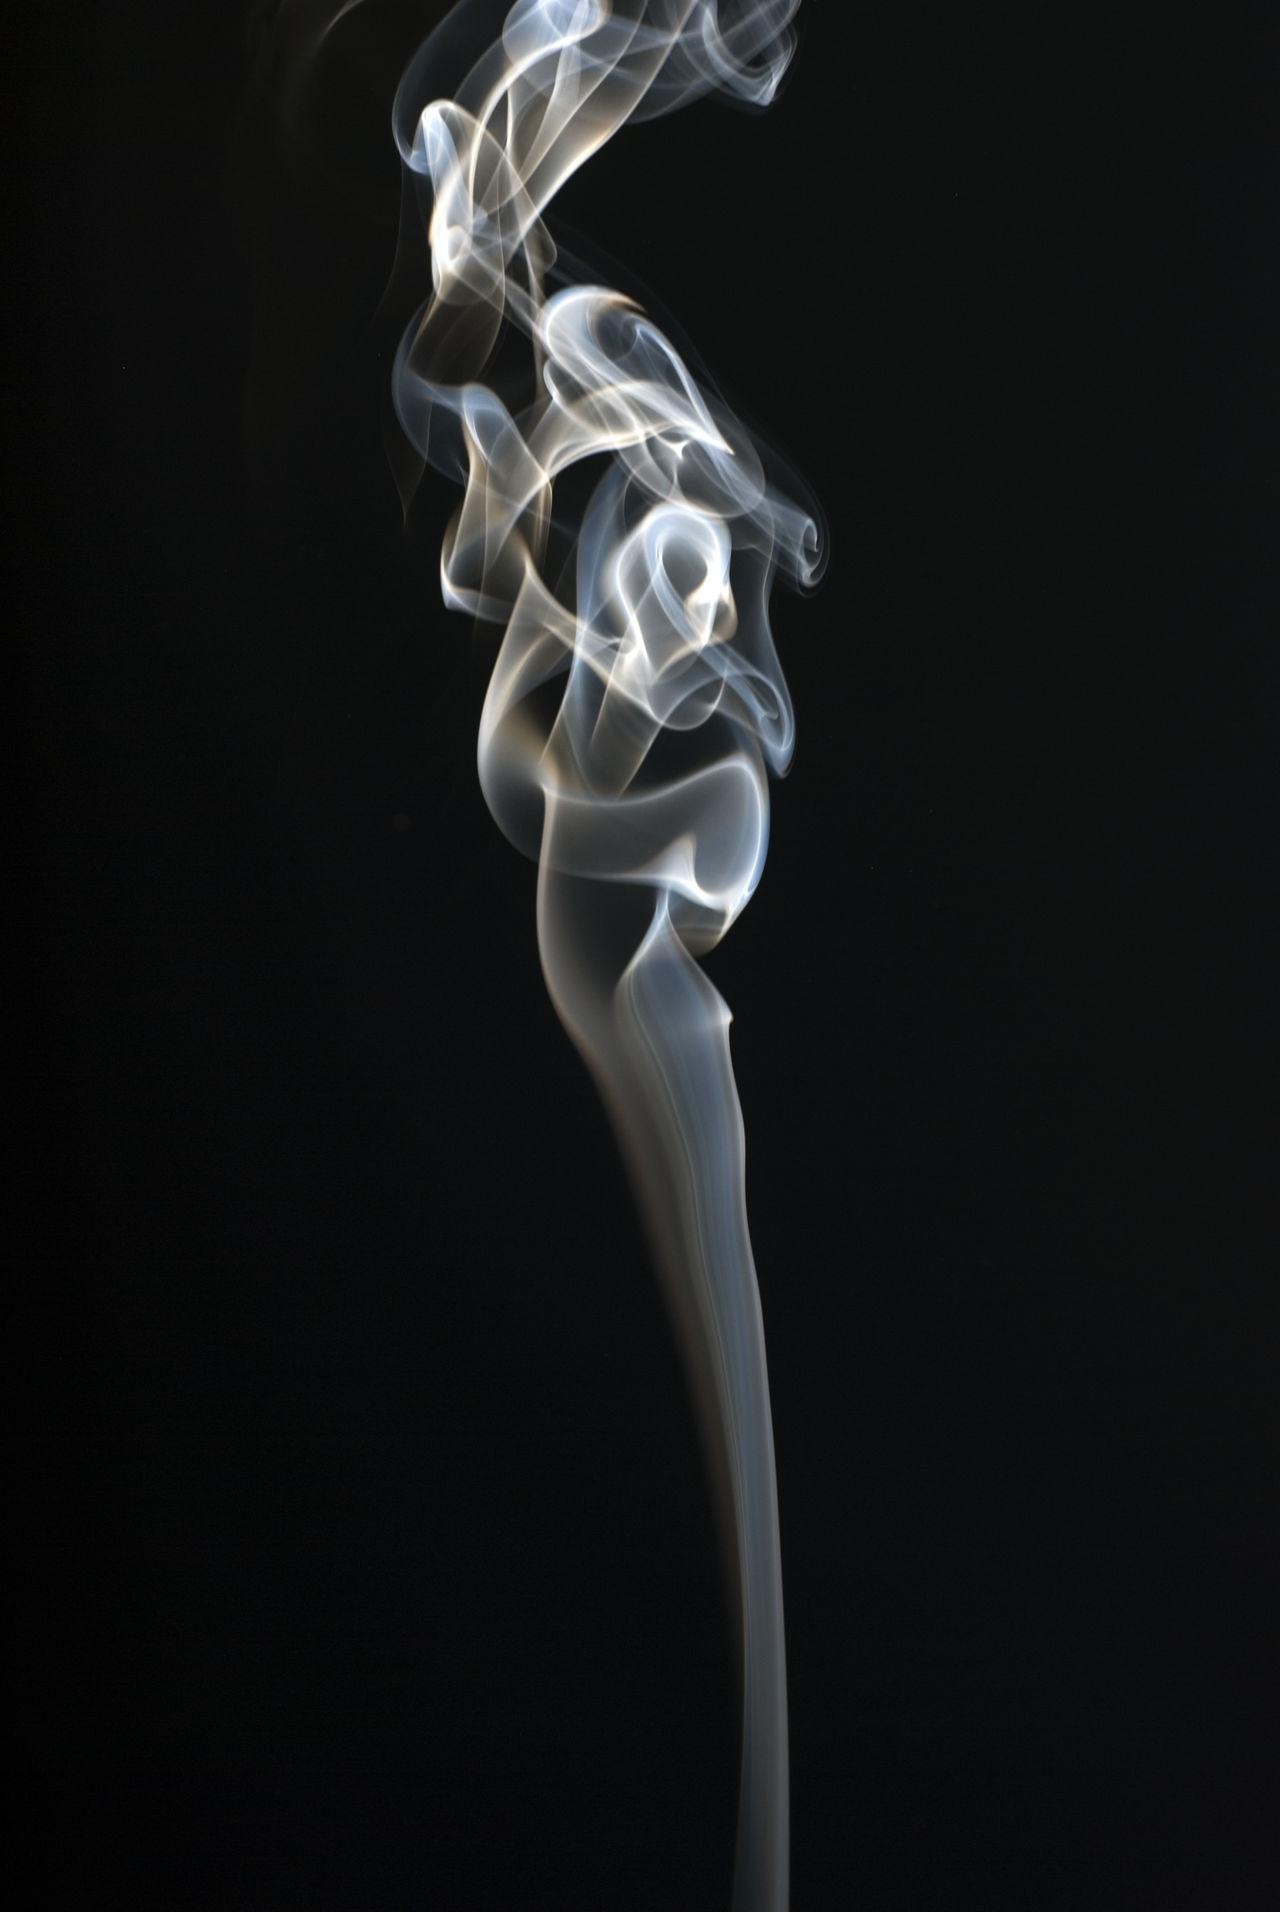 smoke on black Black Black Background Cigarette  Cigarette Time Fragility Incense No People Shape Smoke Smoke - Physical Structure Swirl